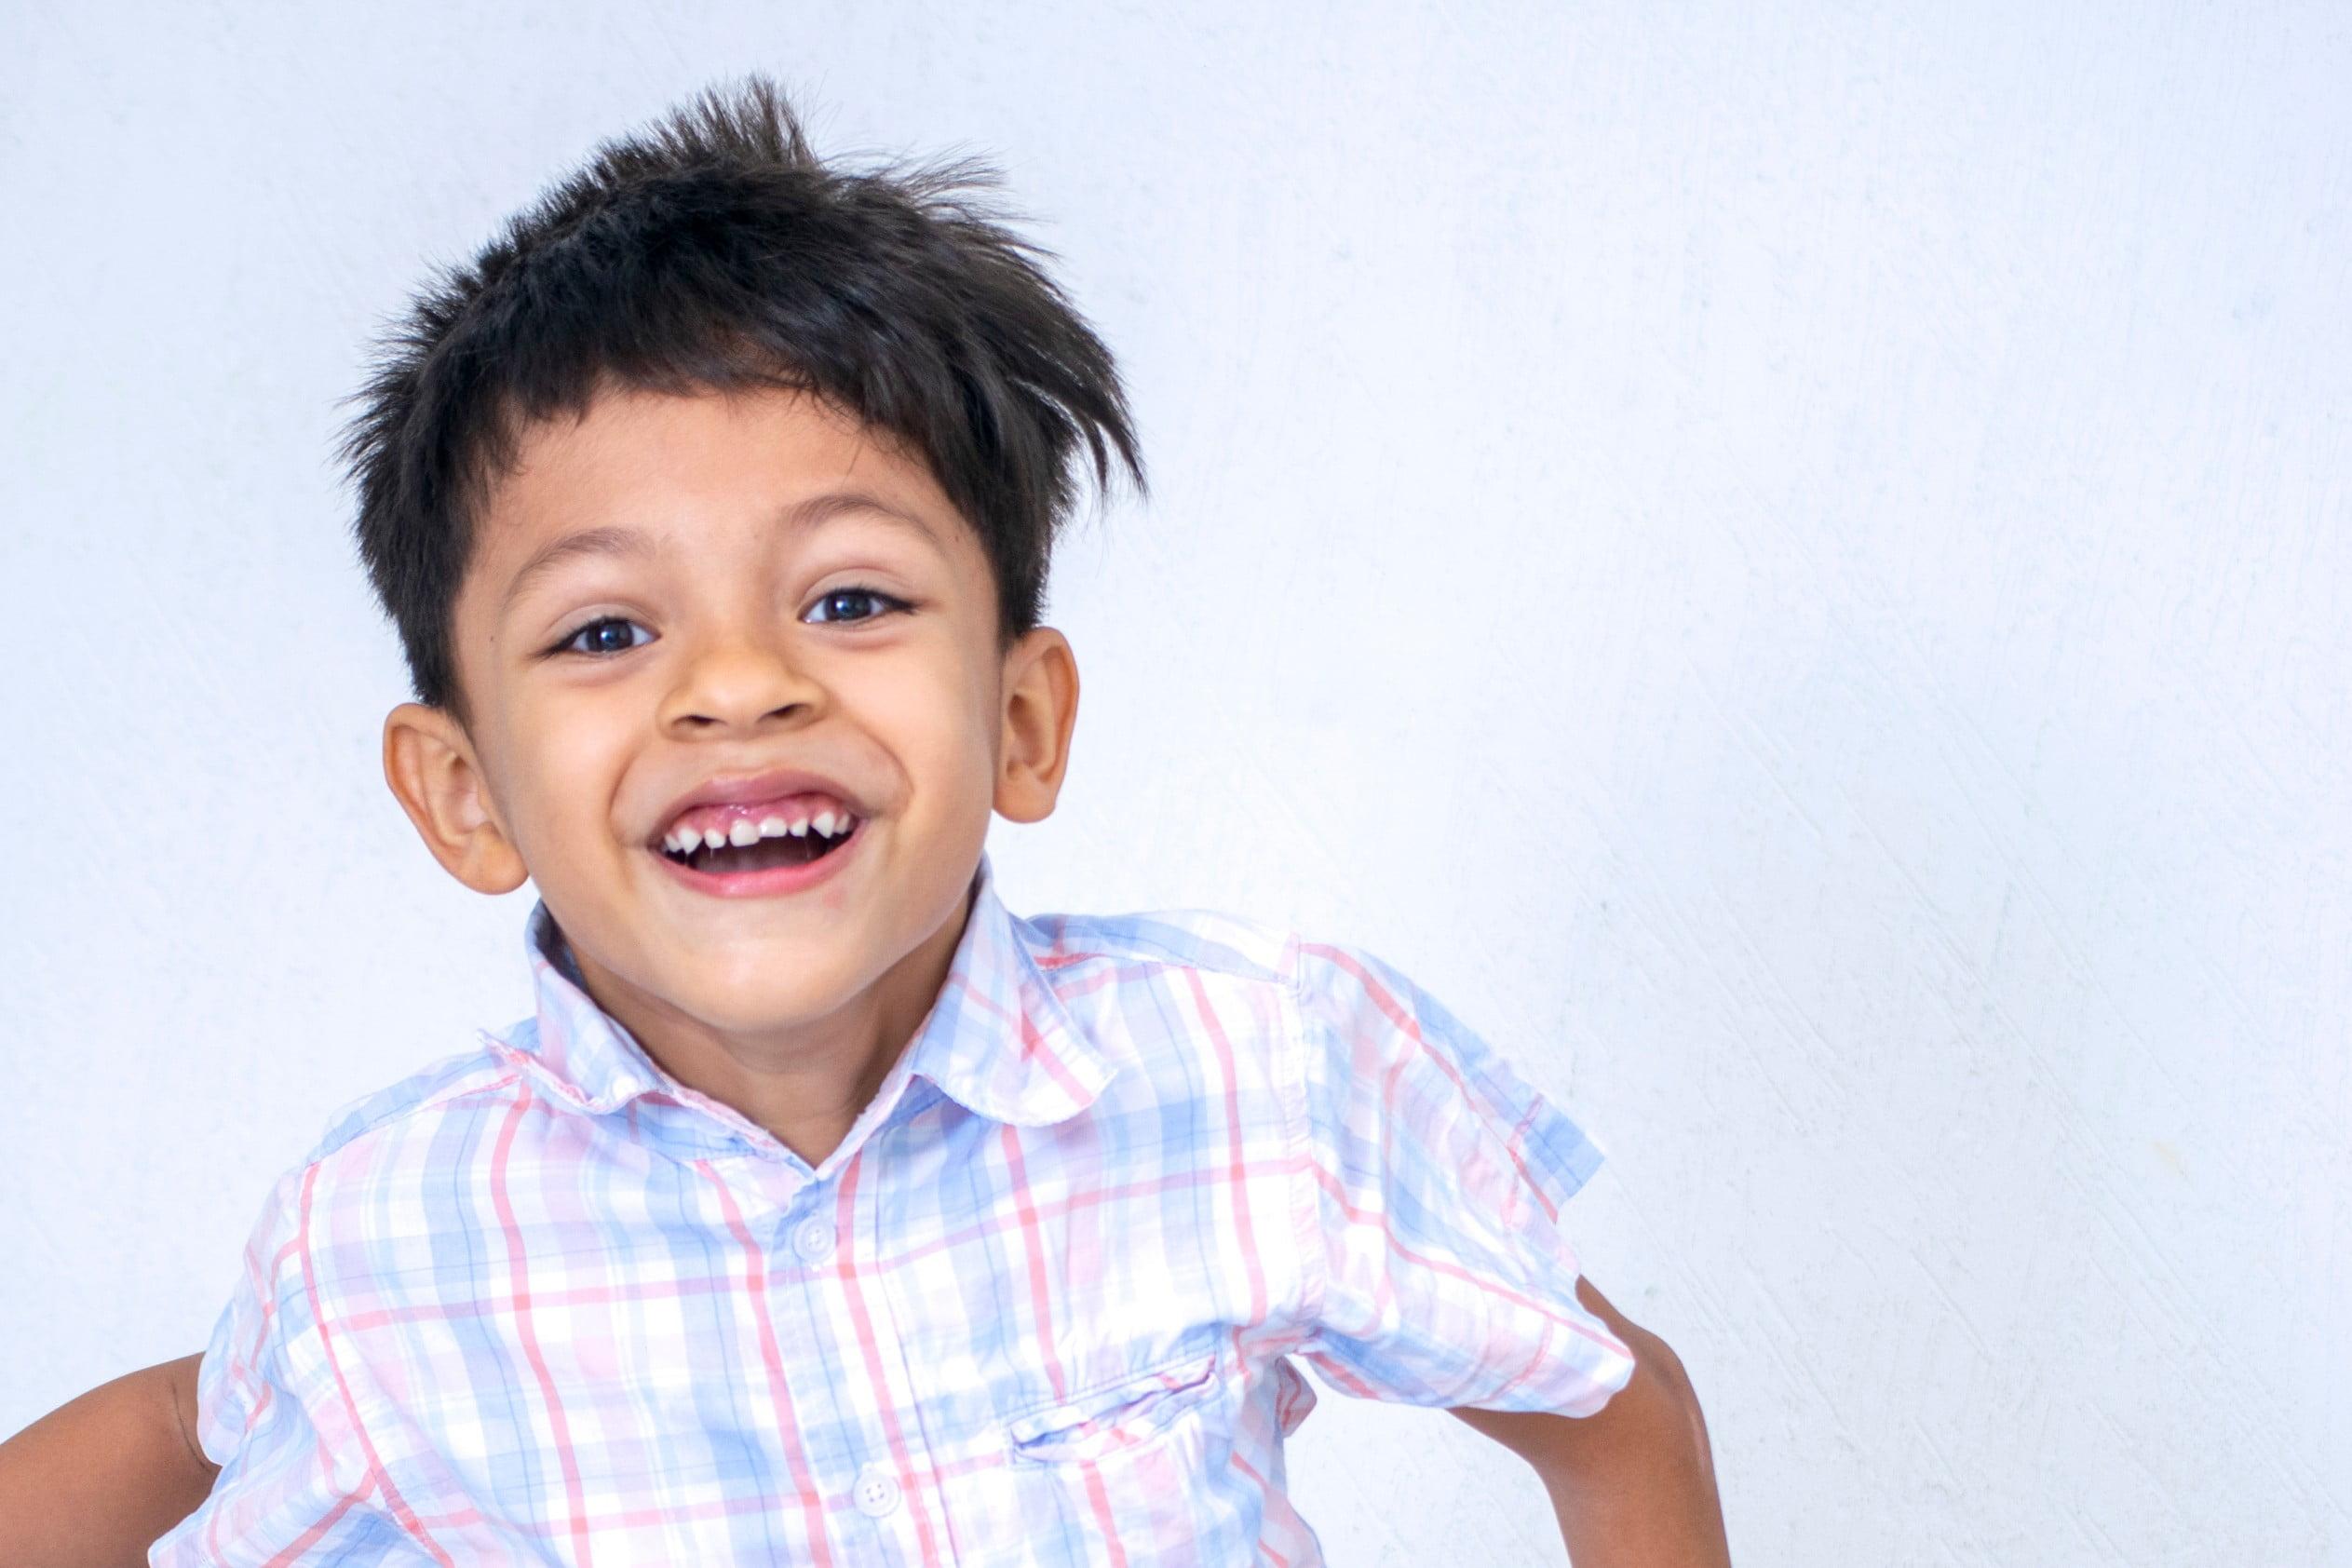 Smiling Boy Smaller File